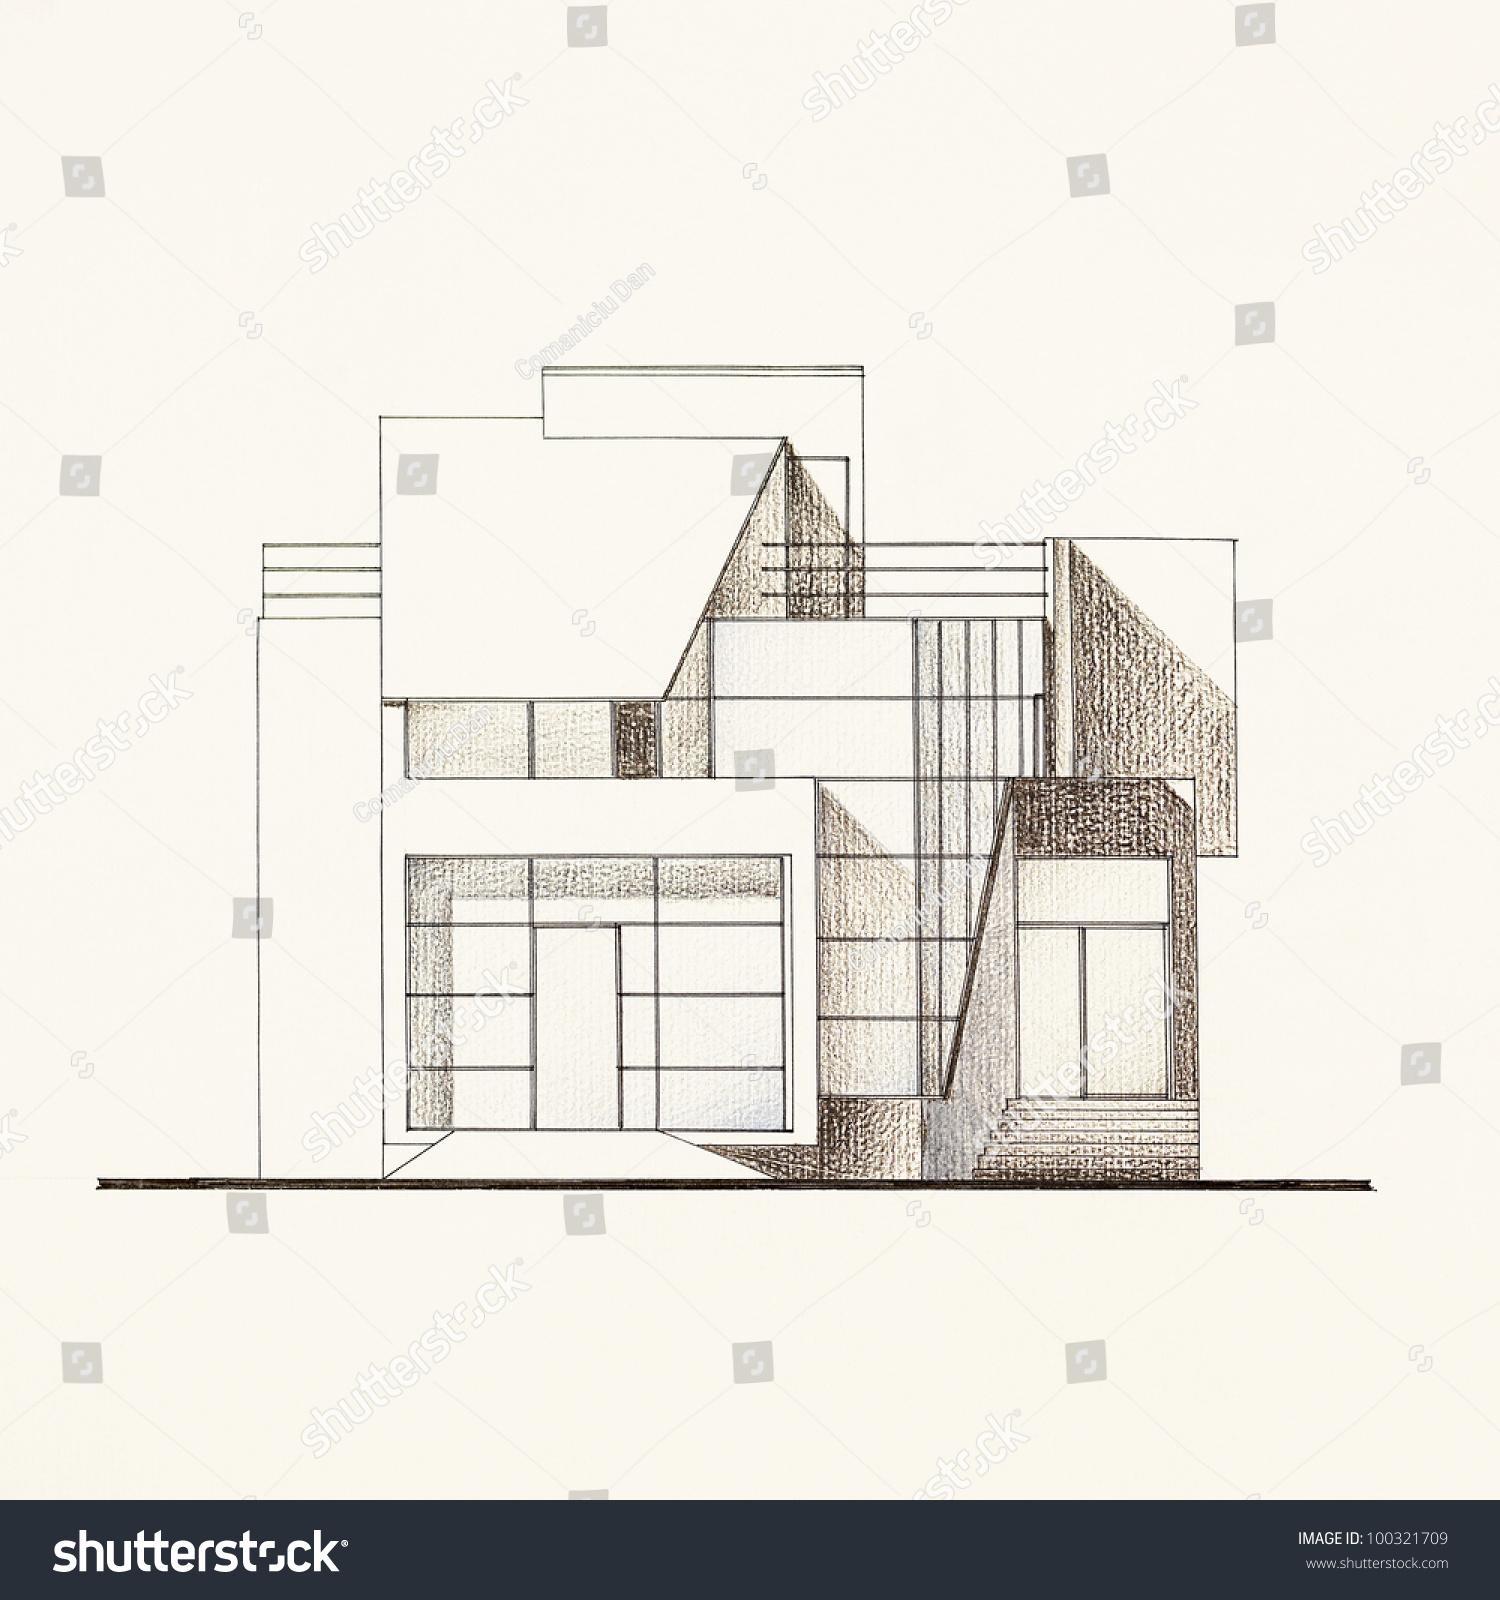 olored rchitectural Blueprint Modern House Facade Stock ... - ^